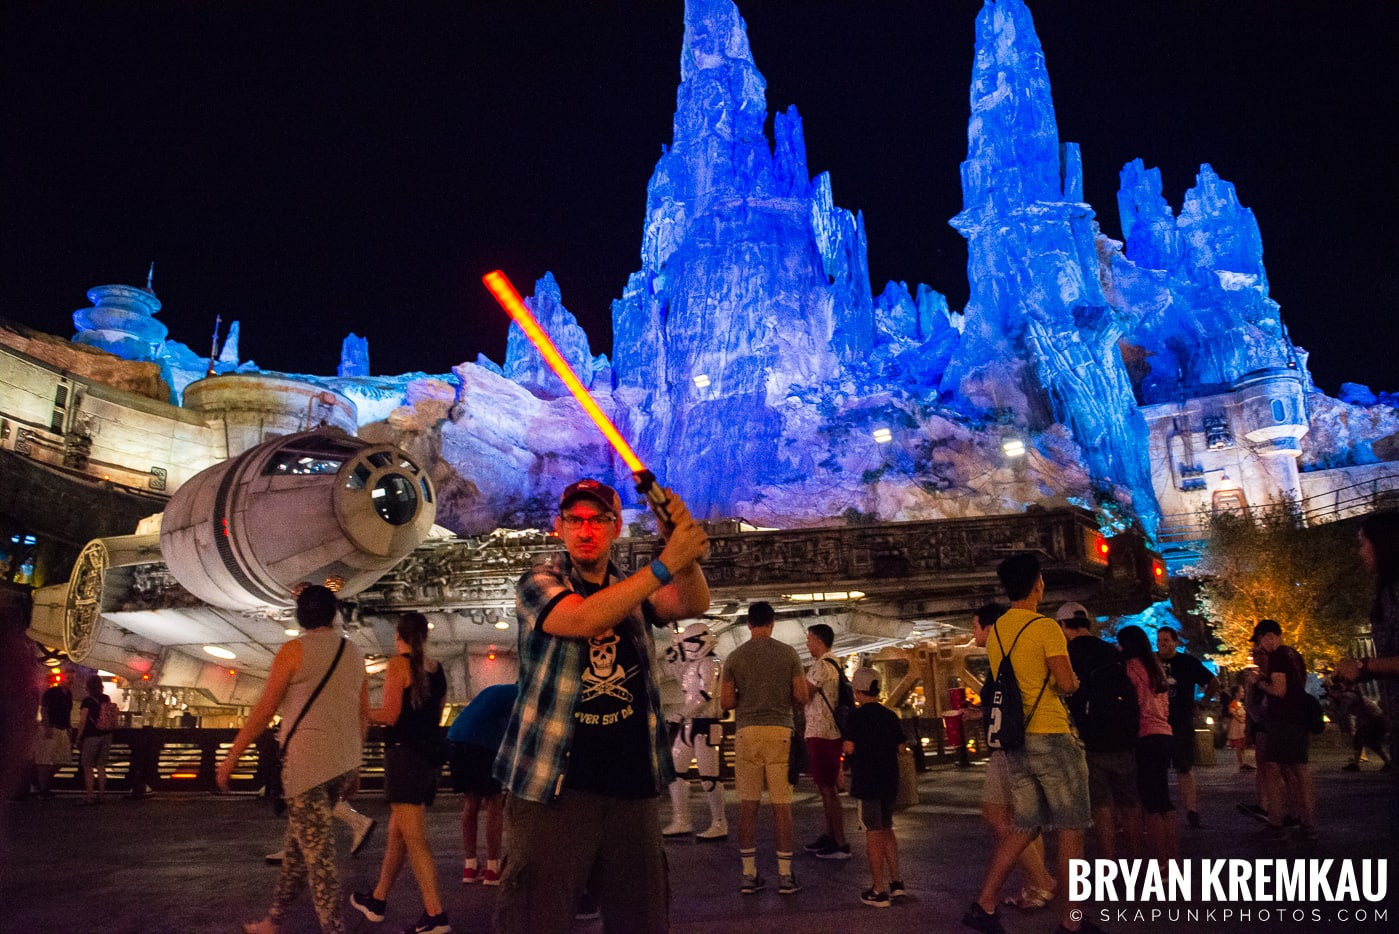 Walt Disney World Vacation: Day 5 (Animal Kingdom / Disney's Hollywood Studios) - 10.3.19 (19)